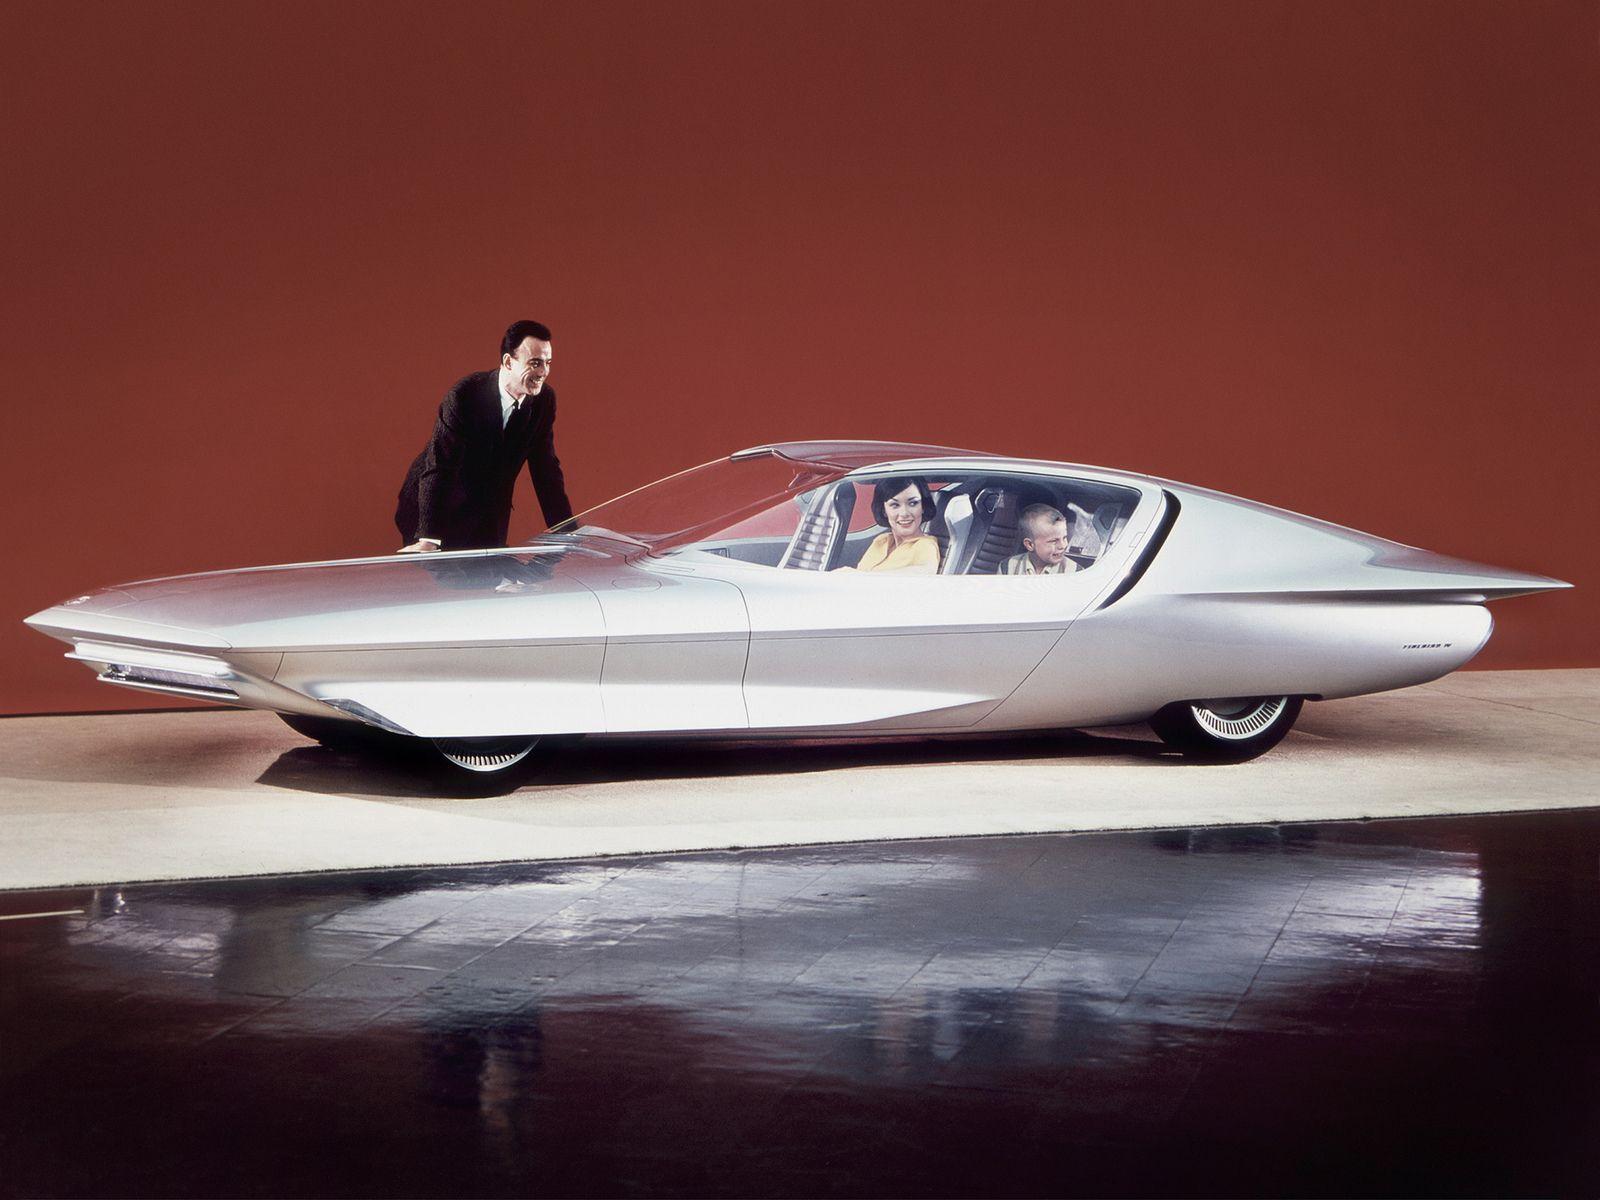 Gm Firebird Iv Concept Car 1964 Concept Cars Weird Cars Buick Century